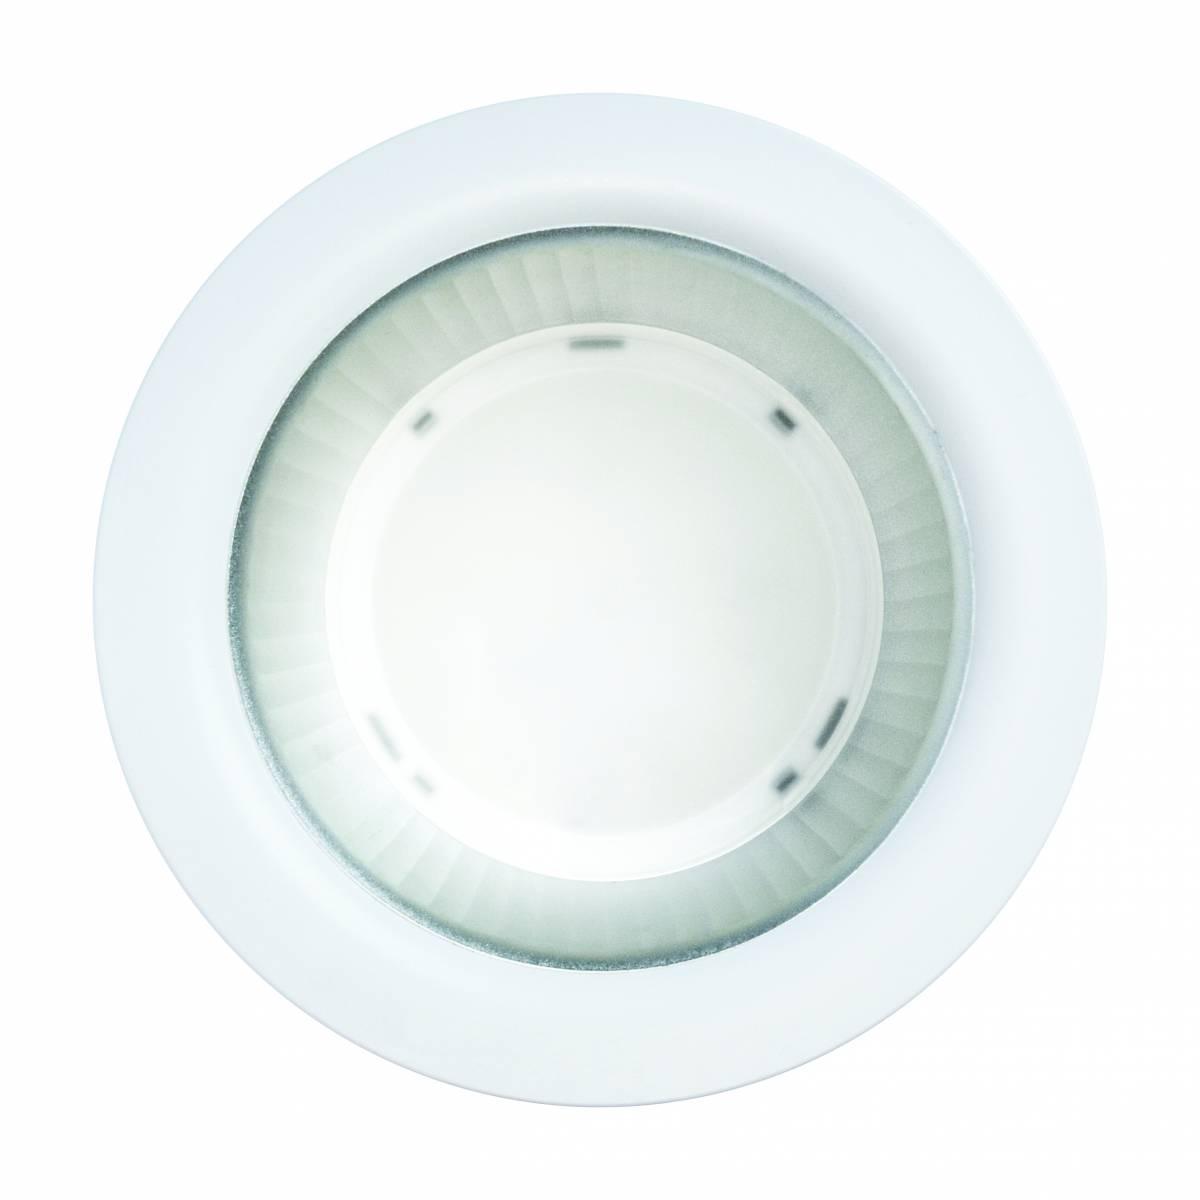 Segon M LED 170 ECO 20W 1700lm 830 ECG IP44 white